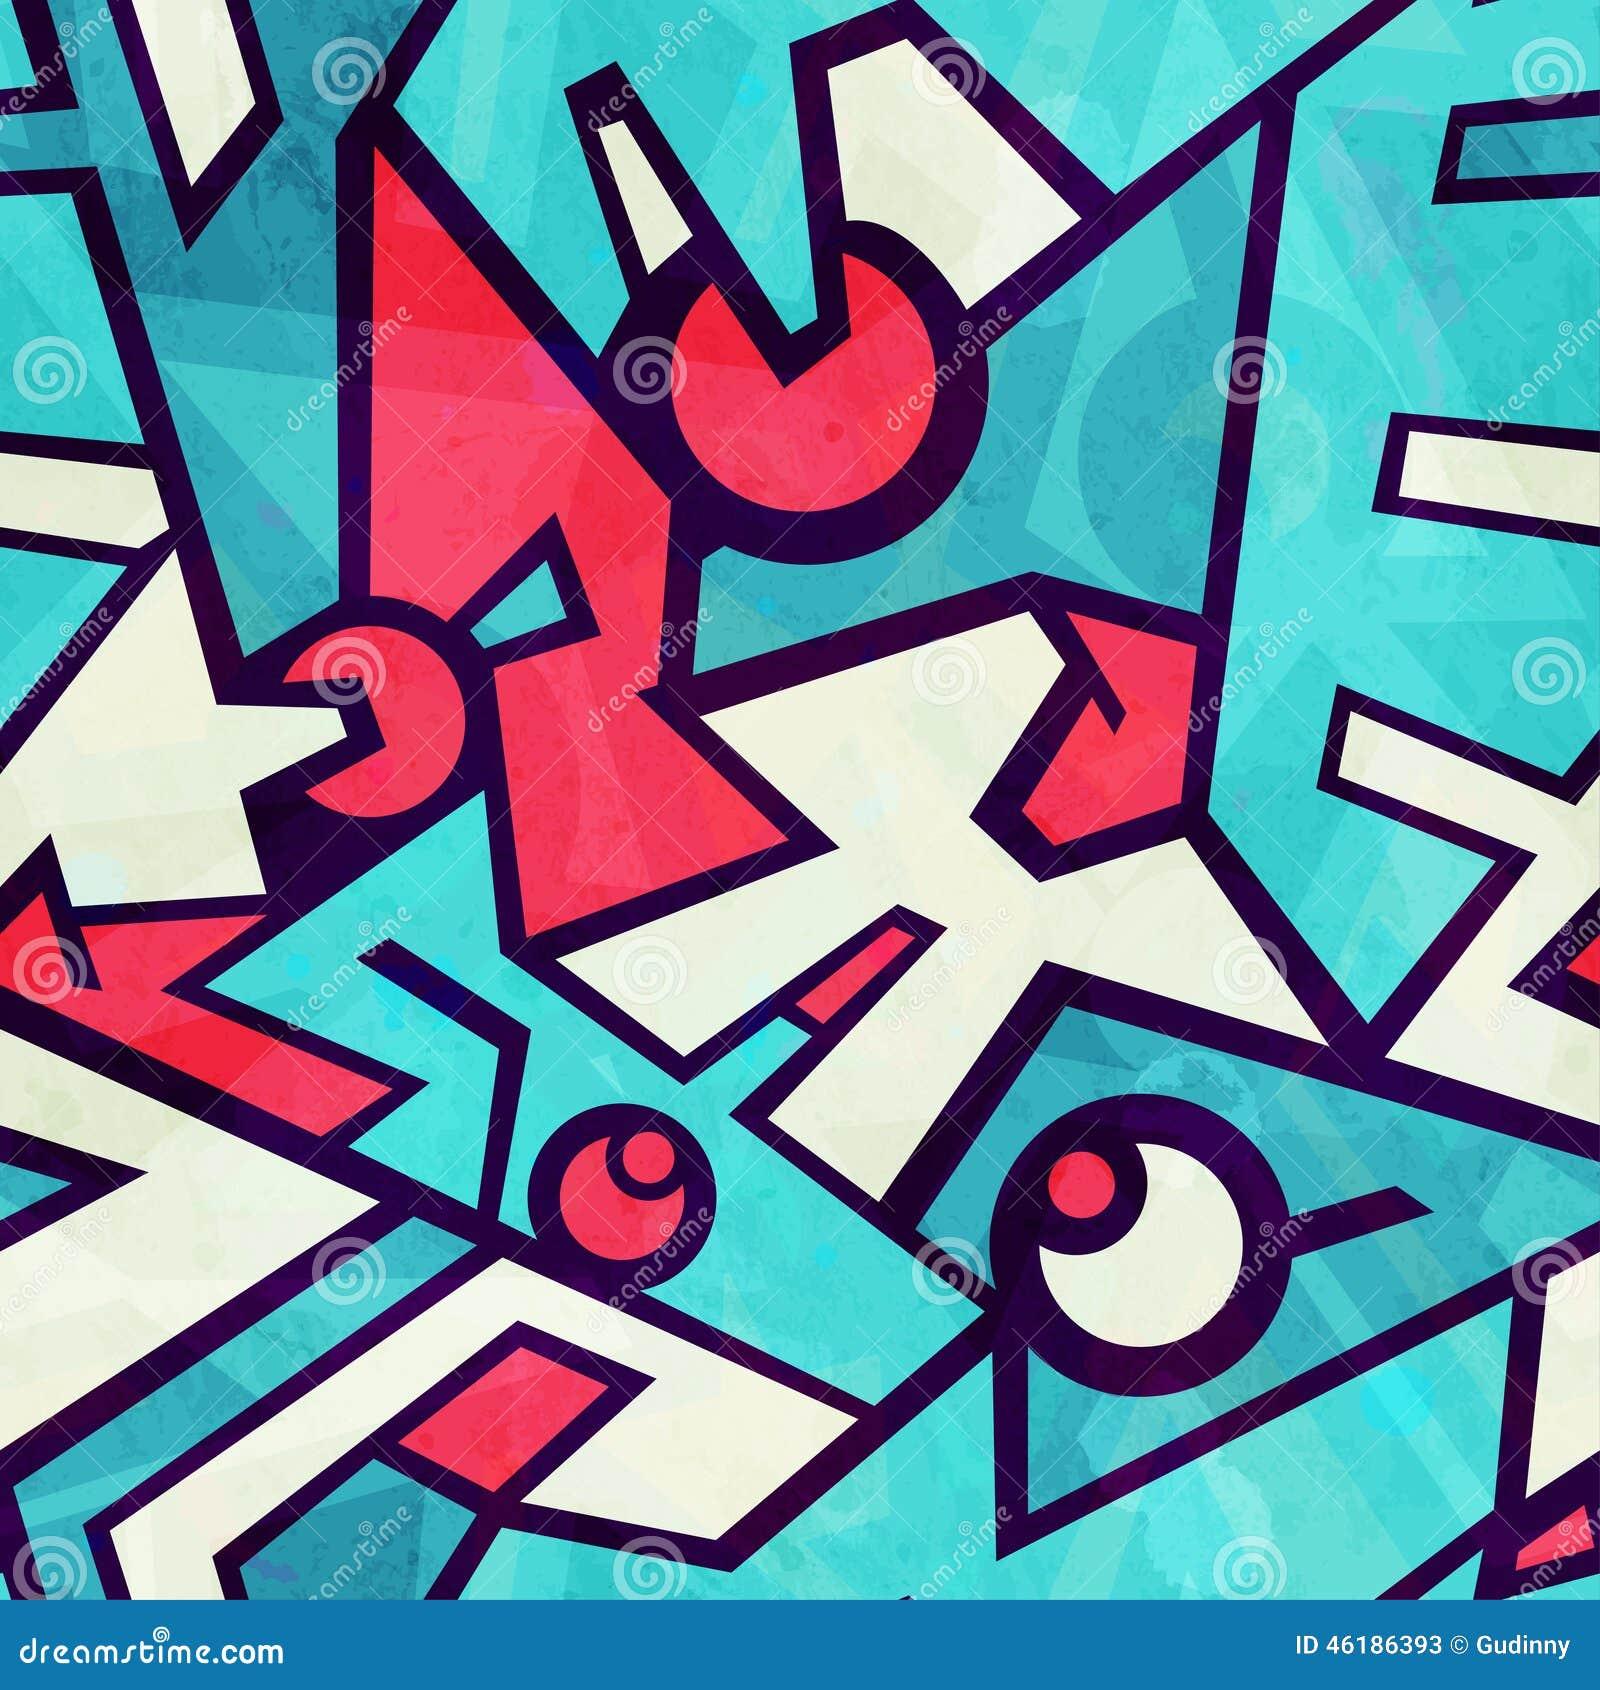 Futuristic blue seamless pattern with grunge effect